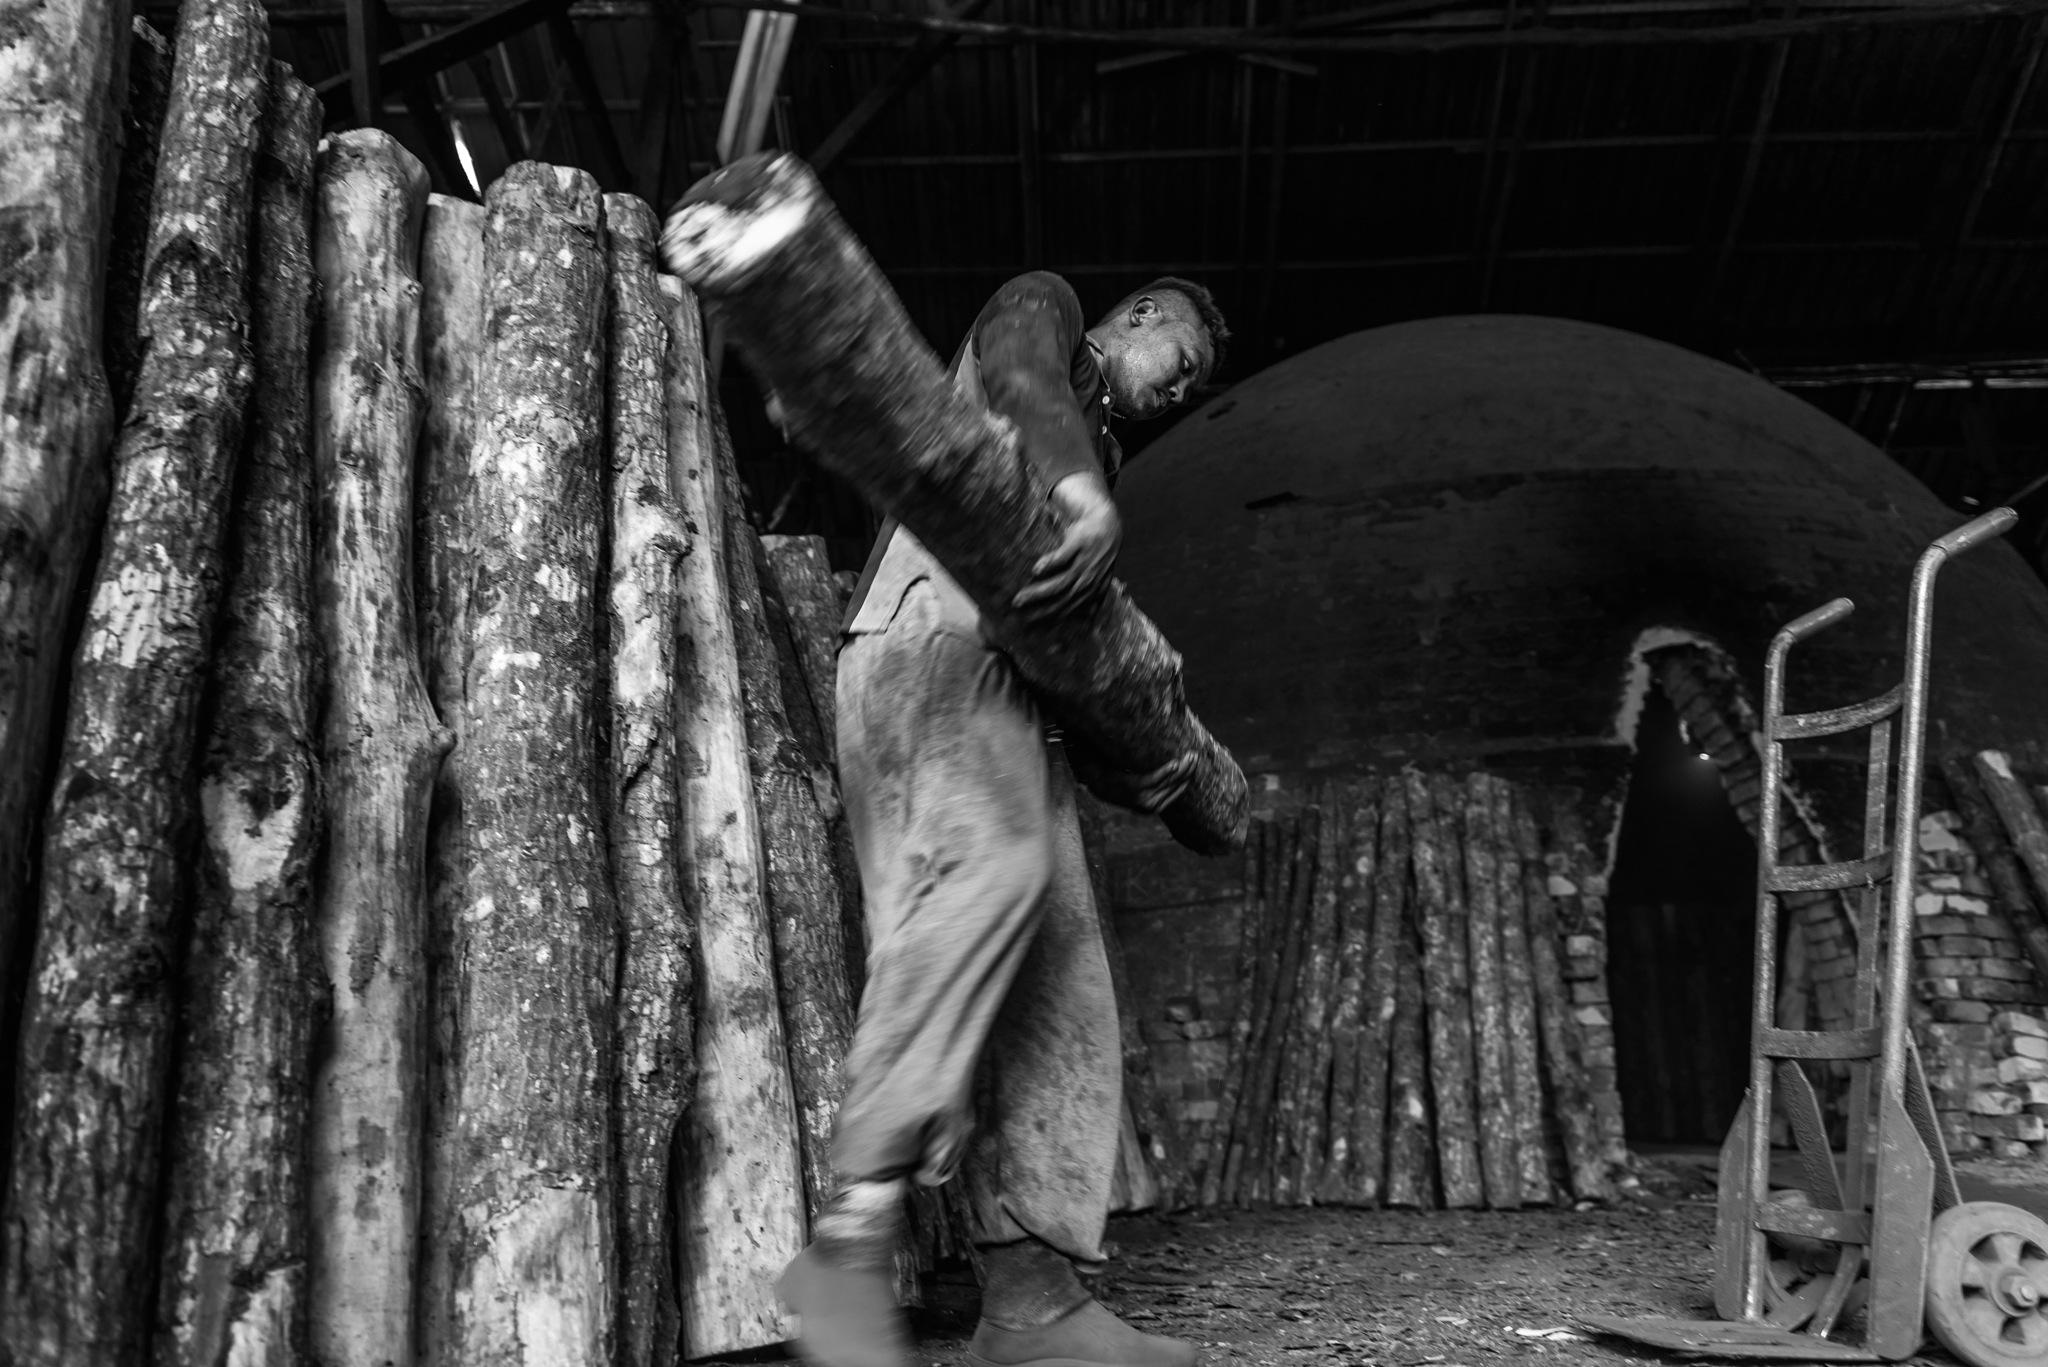 Sepetang 2014/04 - Charcoal Factory - #22 by klchin66